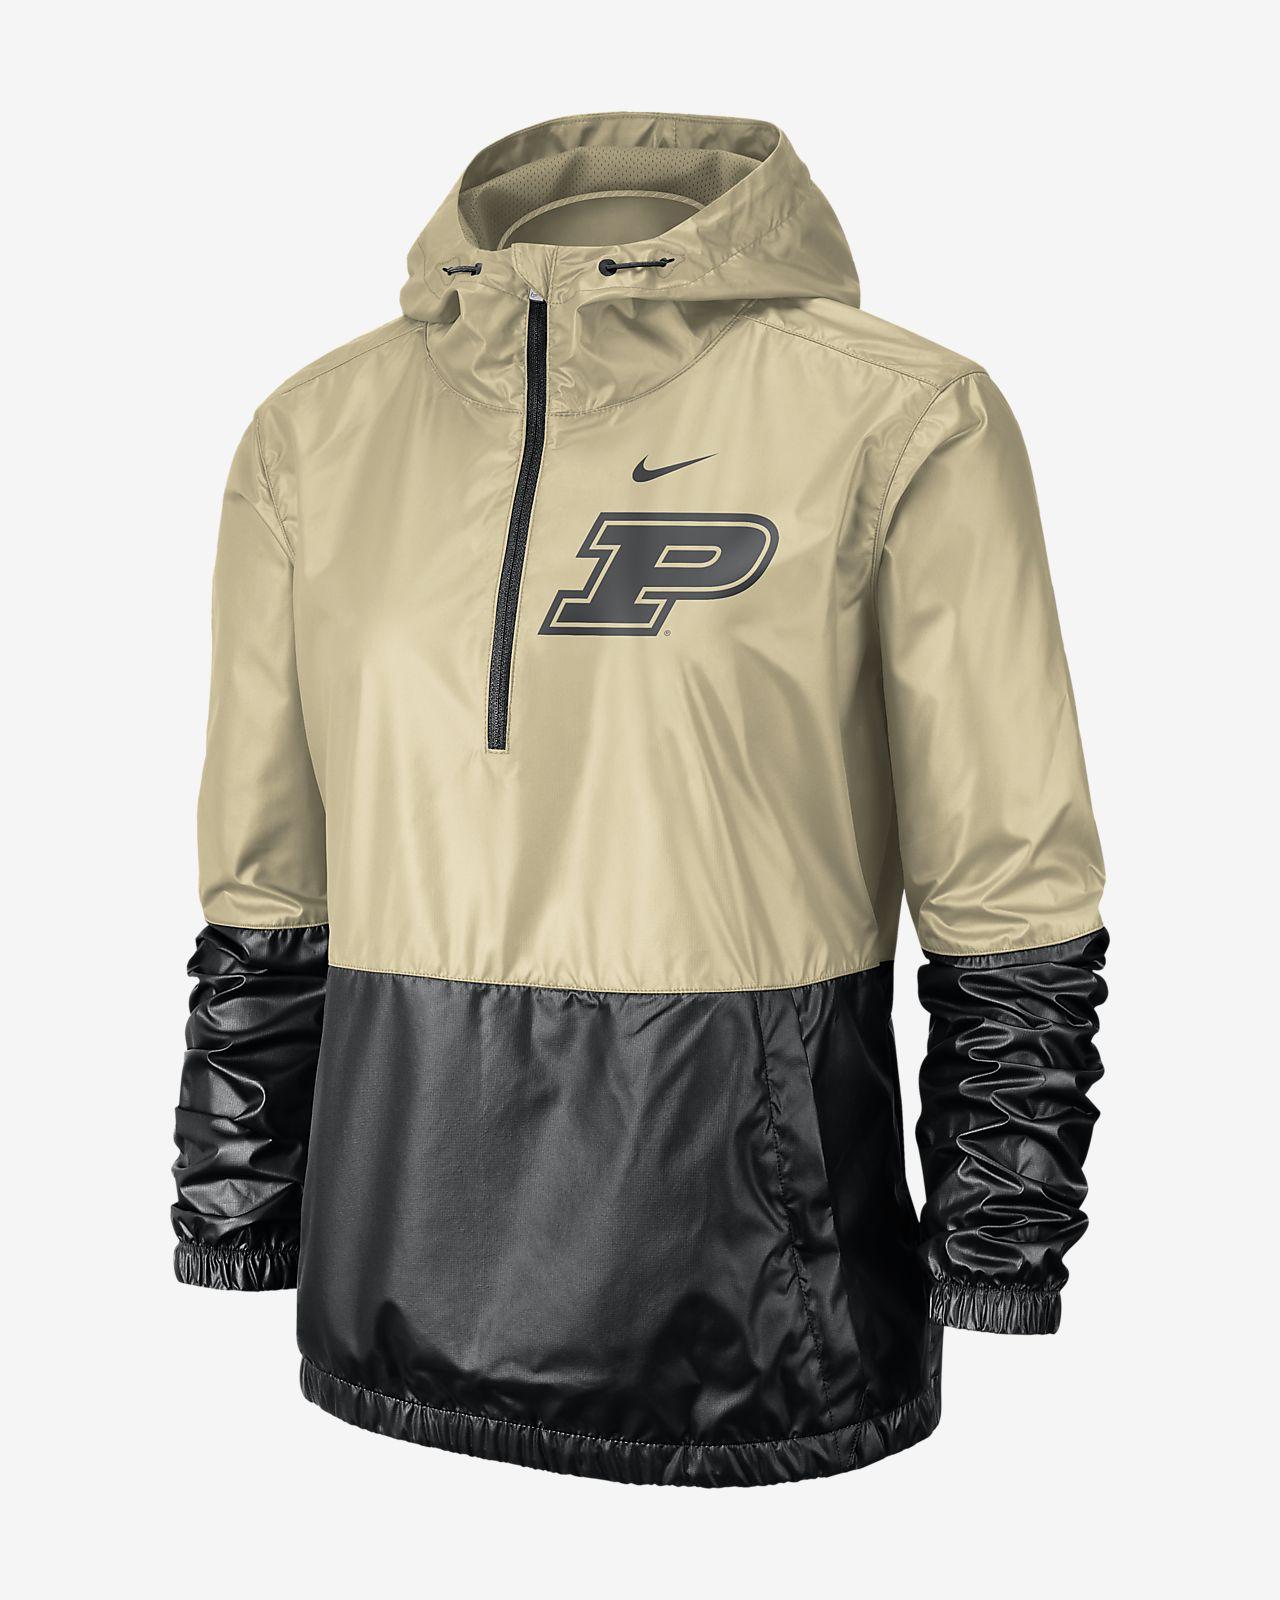 Nike College Anorak (Purdue) Women's Jacket